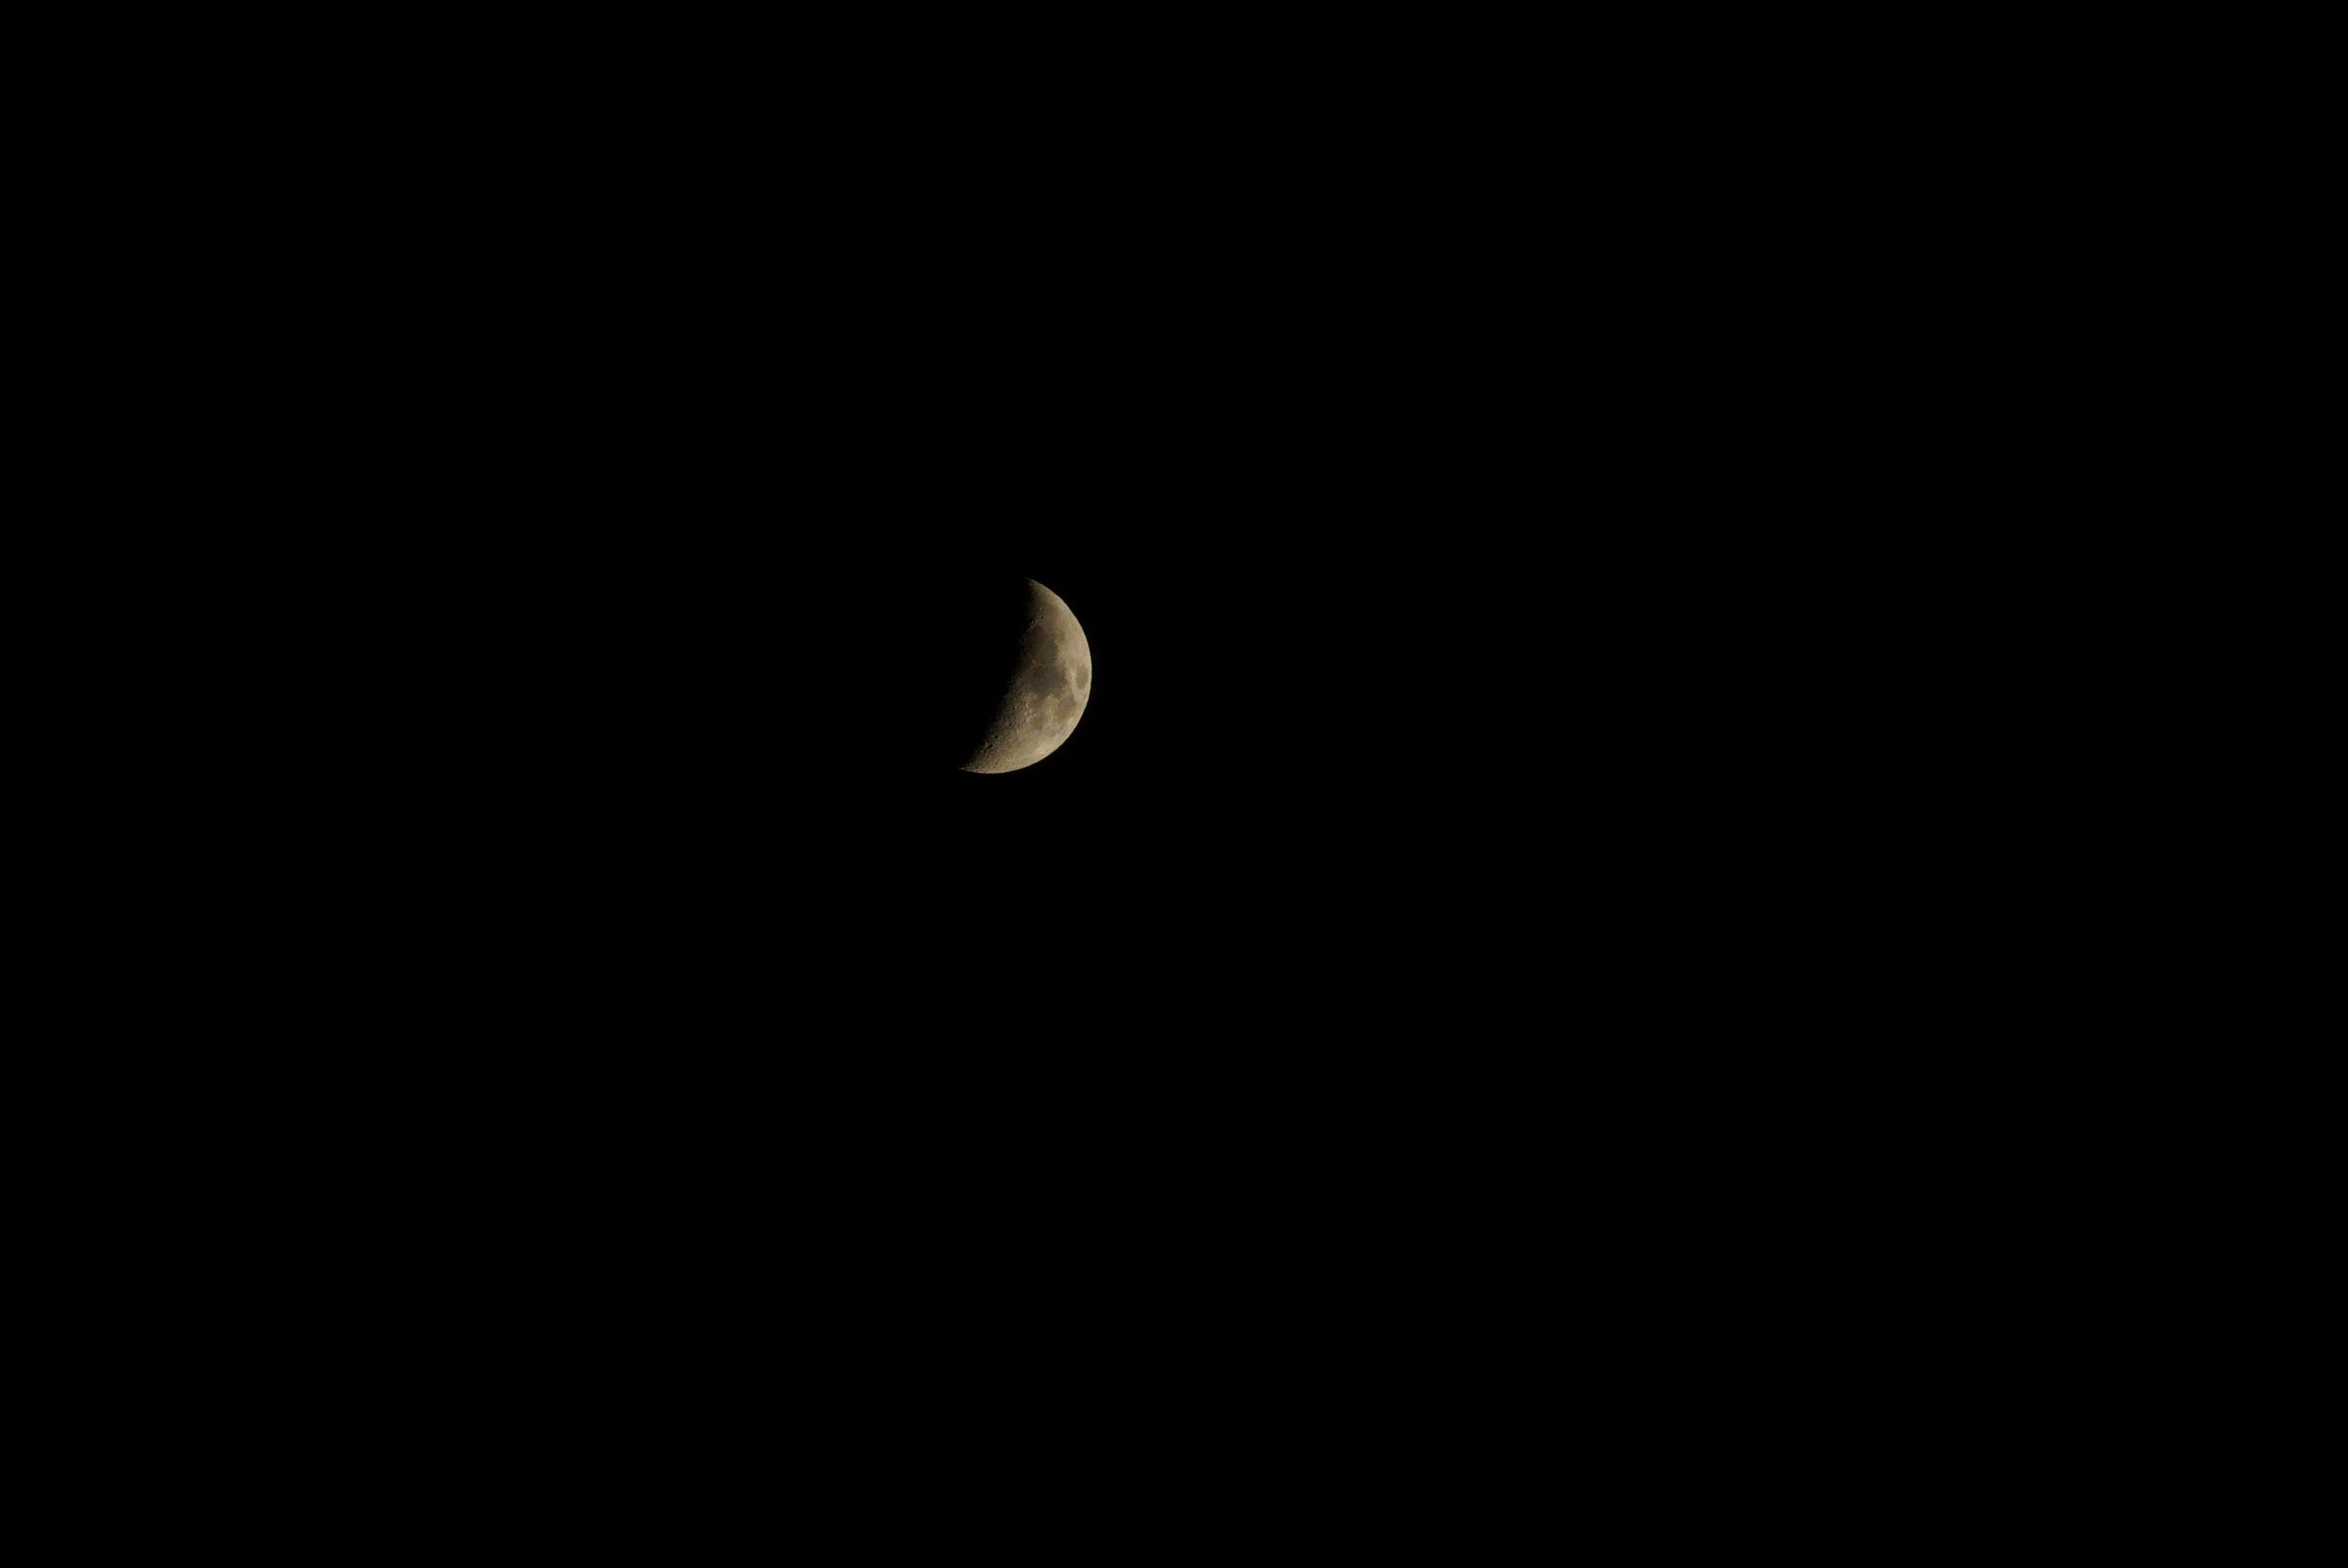 Lune de 26 novembre. A7s+Tamron 300mm